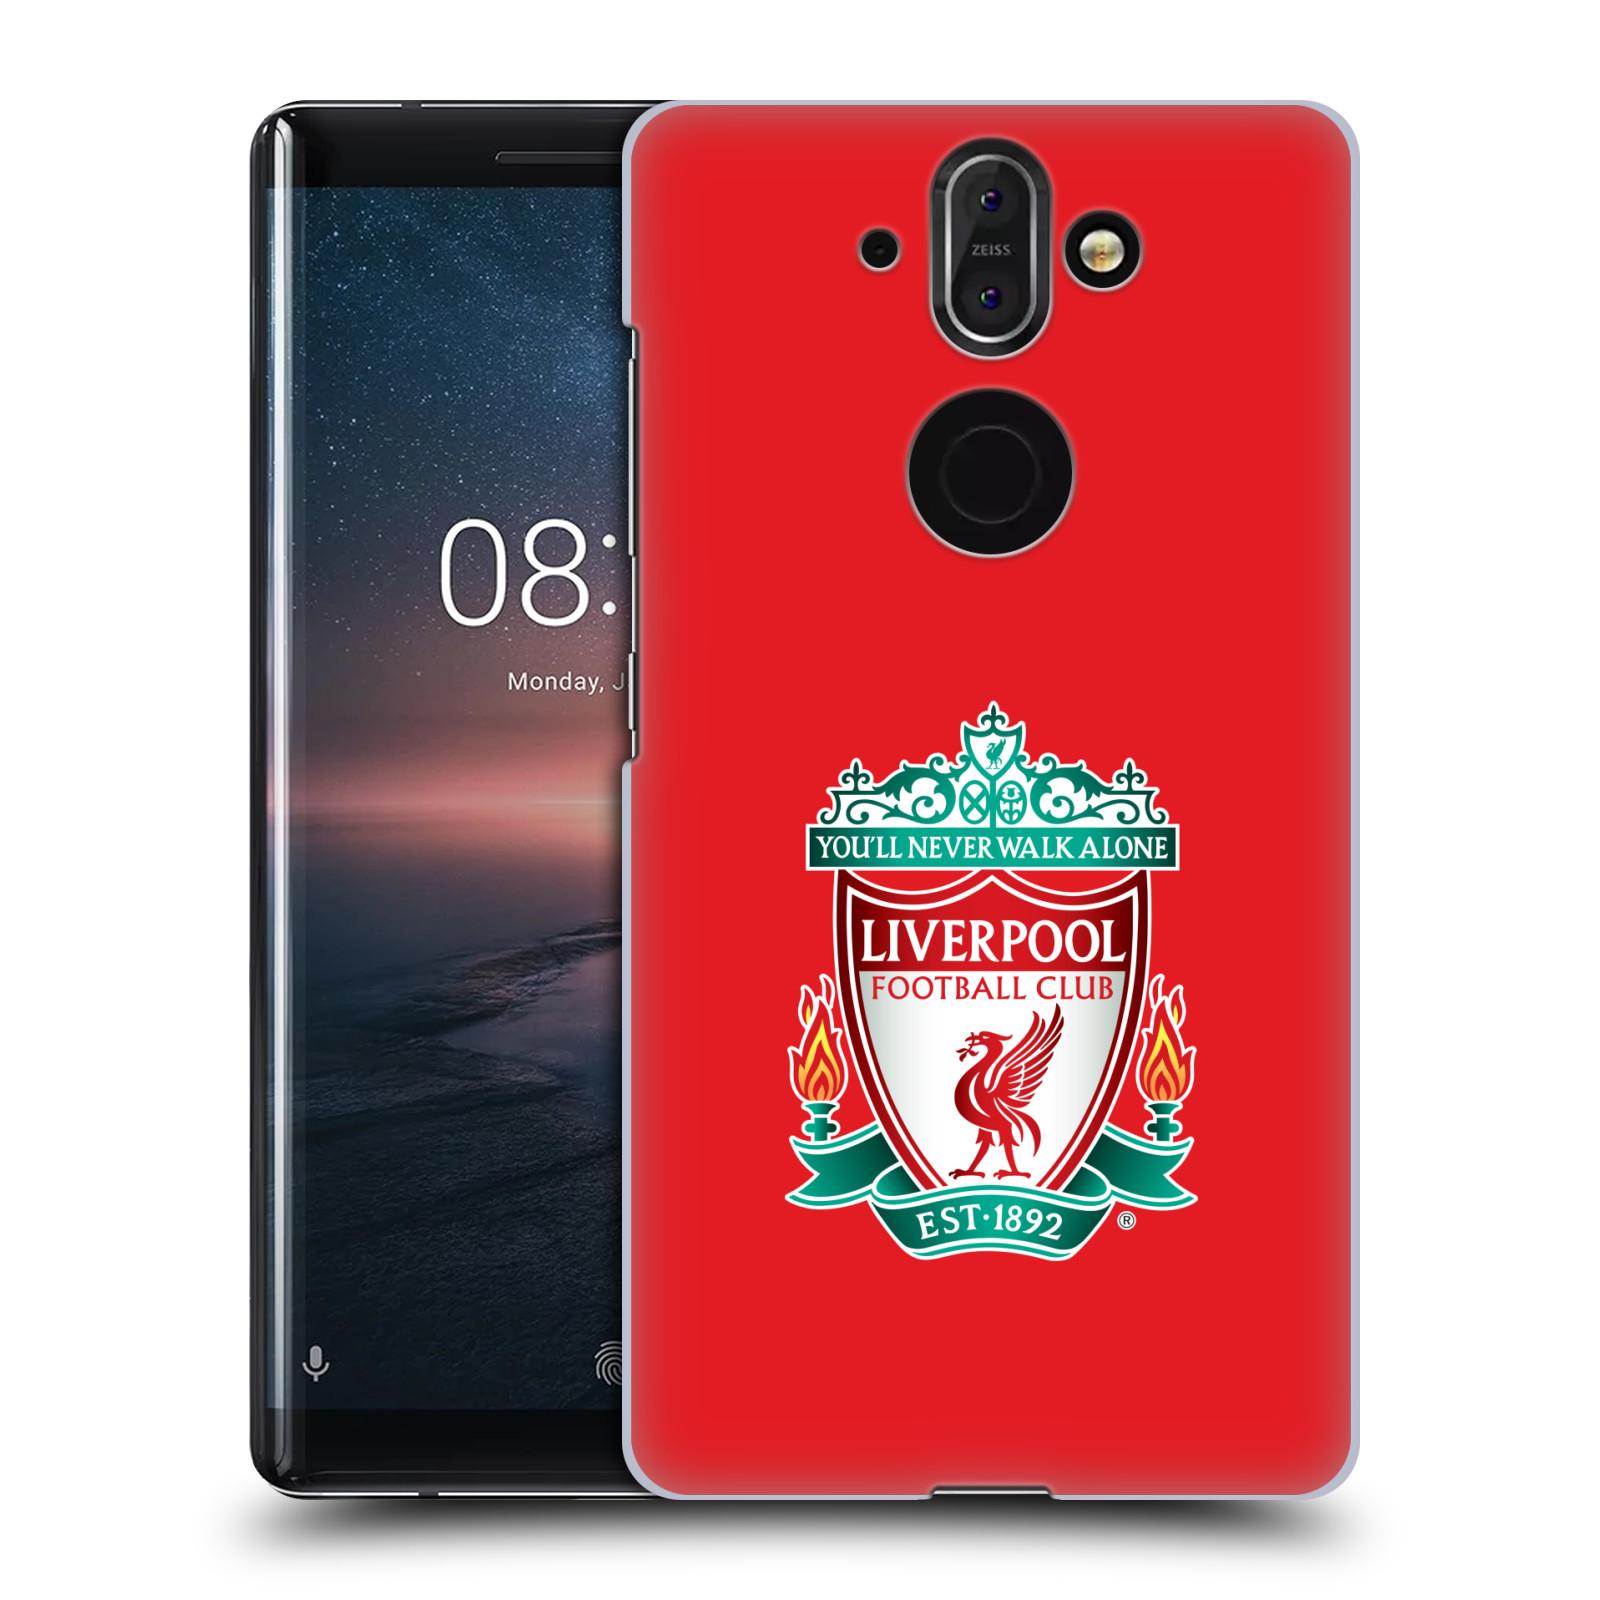 Plastové pouzdro na mobil Nokia 8 Sirocco - Head Case - ZNAK LIVERPOOL FC OFFICIAL RED